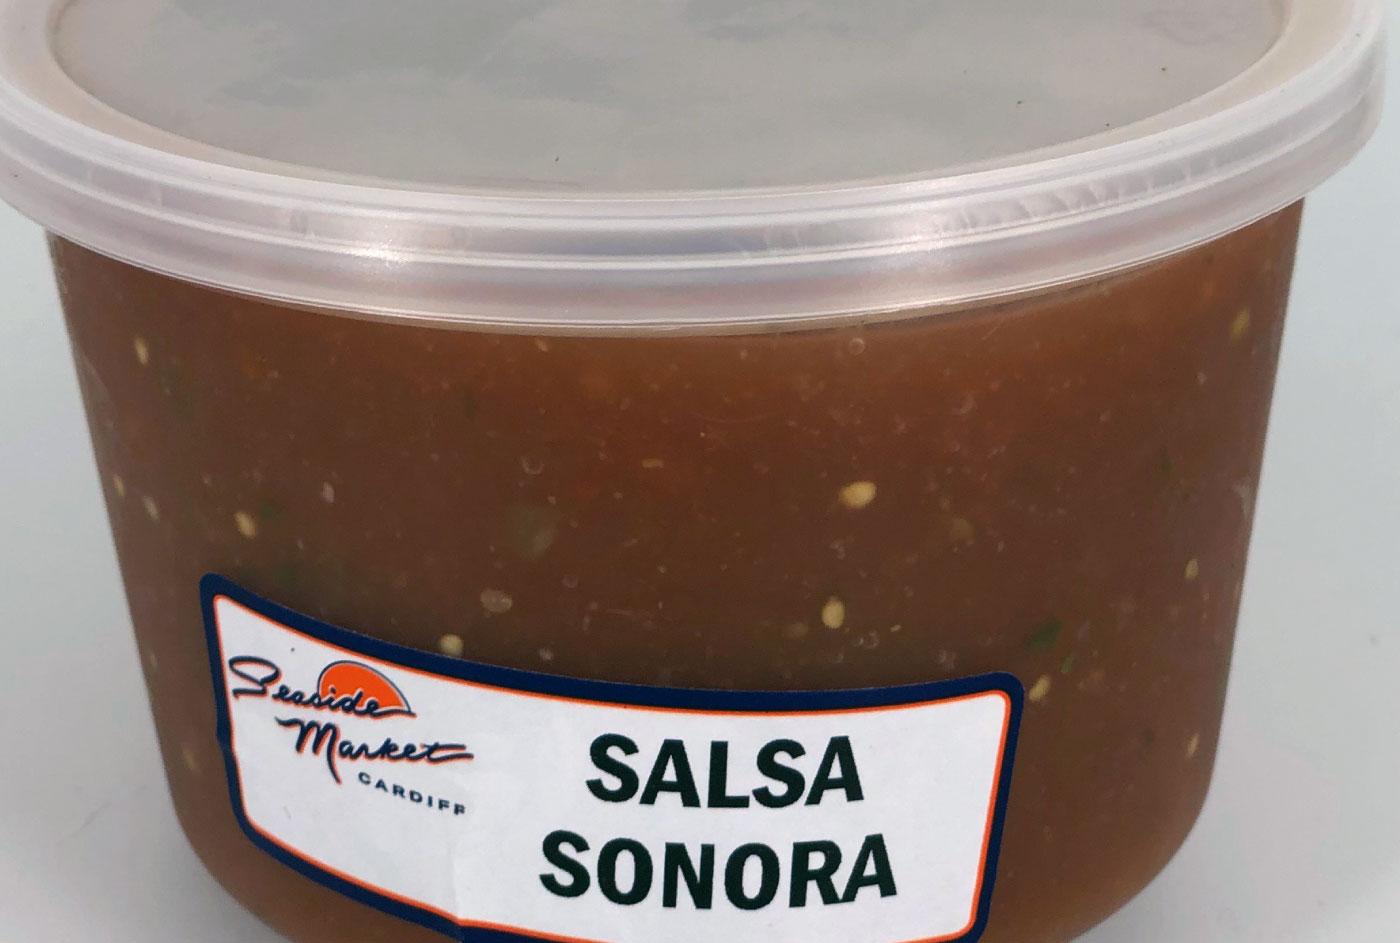 Salsa Sonora